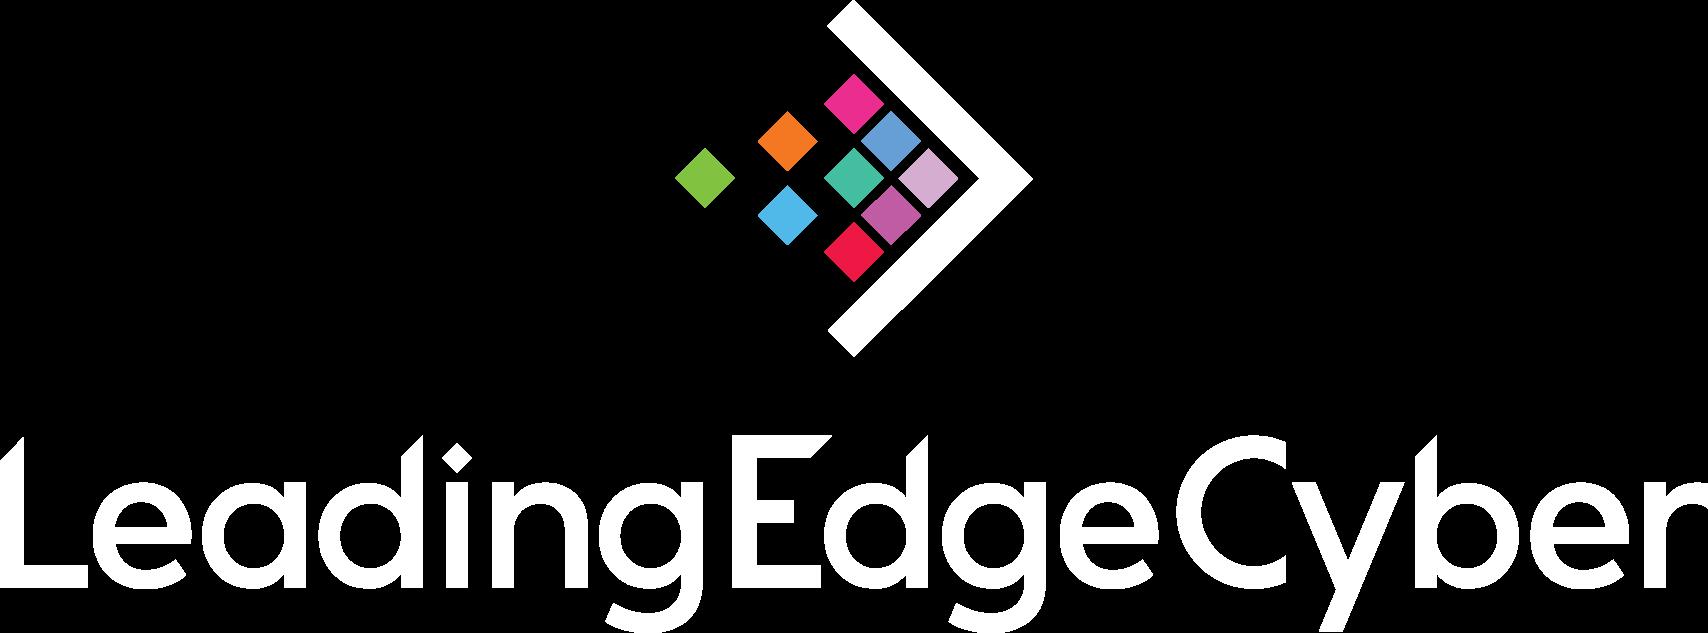 Leading Edge Cyber